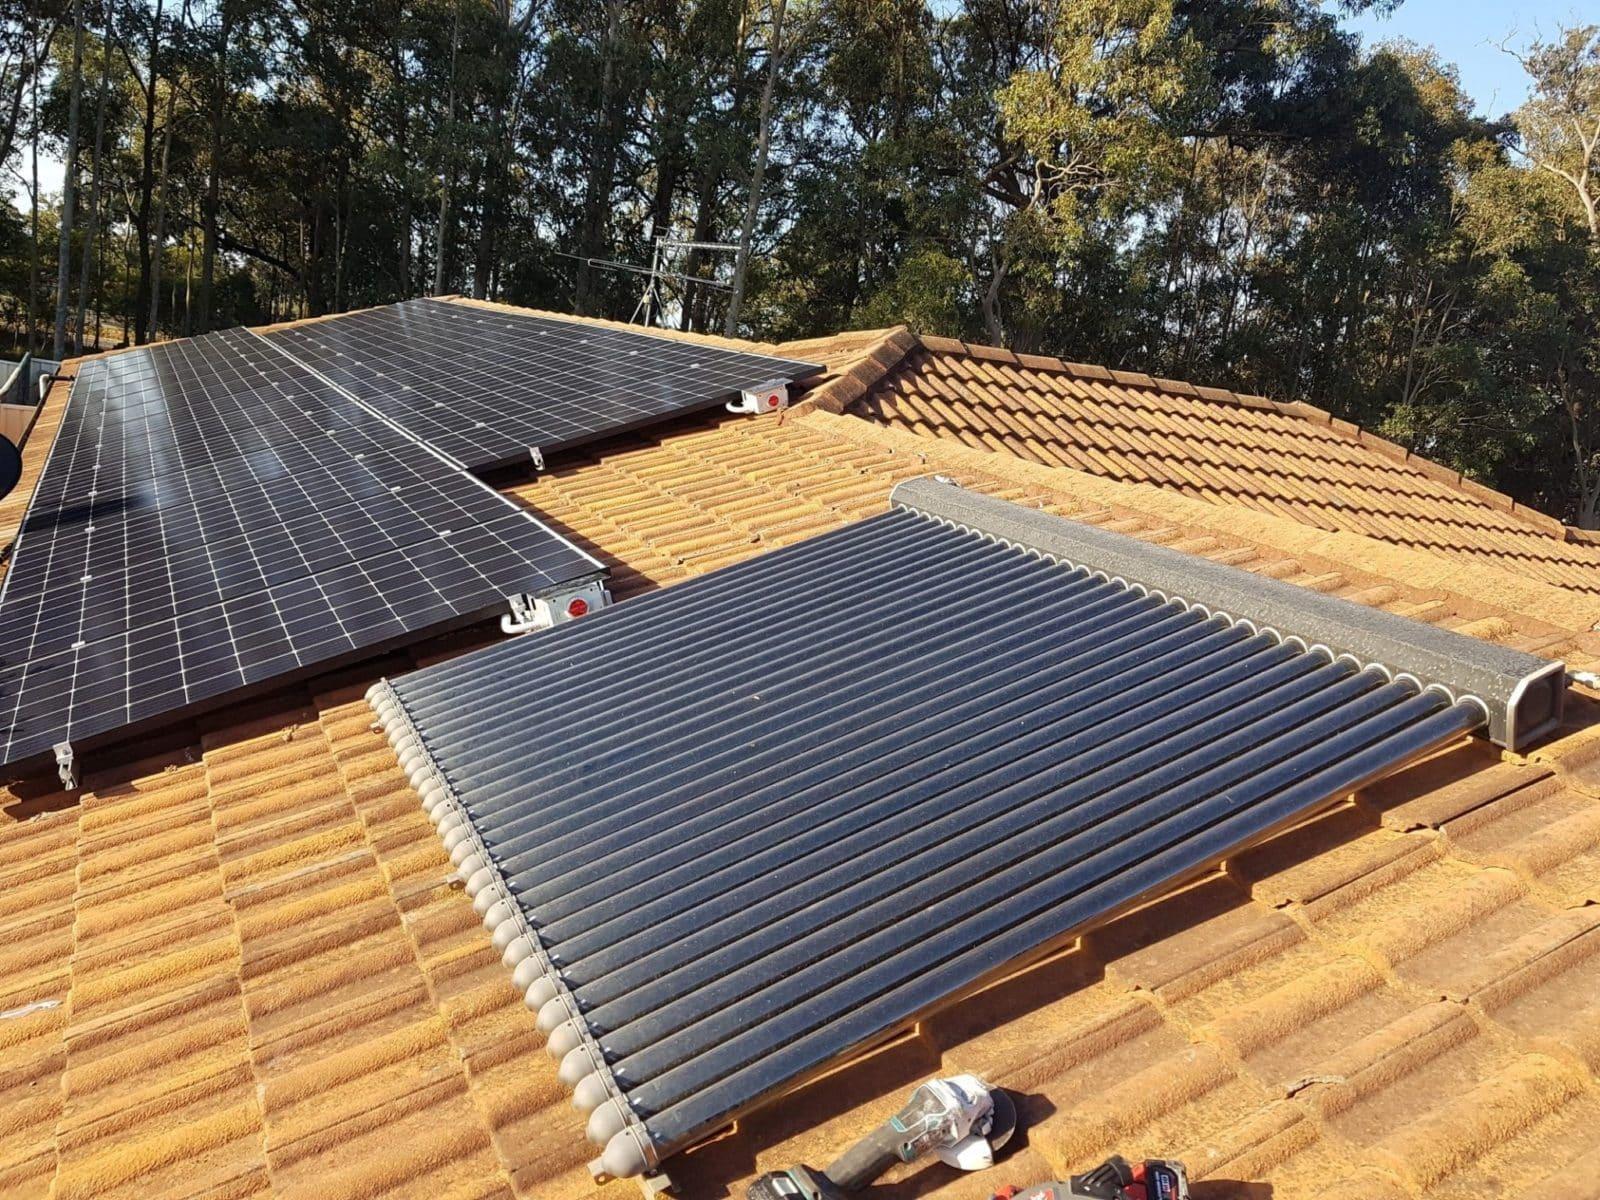 Aztech solar Installation projects, Solar products, Solar panels, Solar battery storage, Solar power inverter